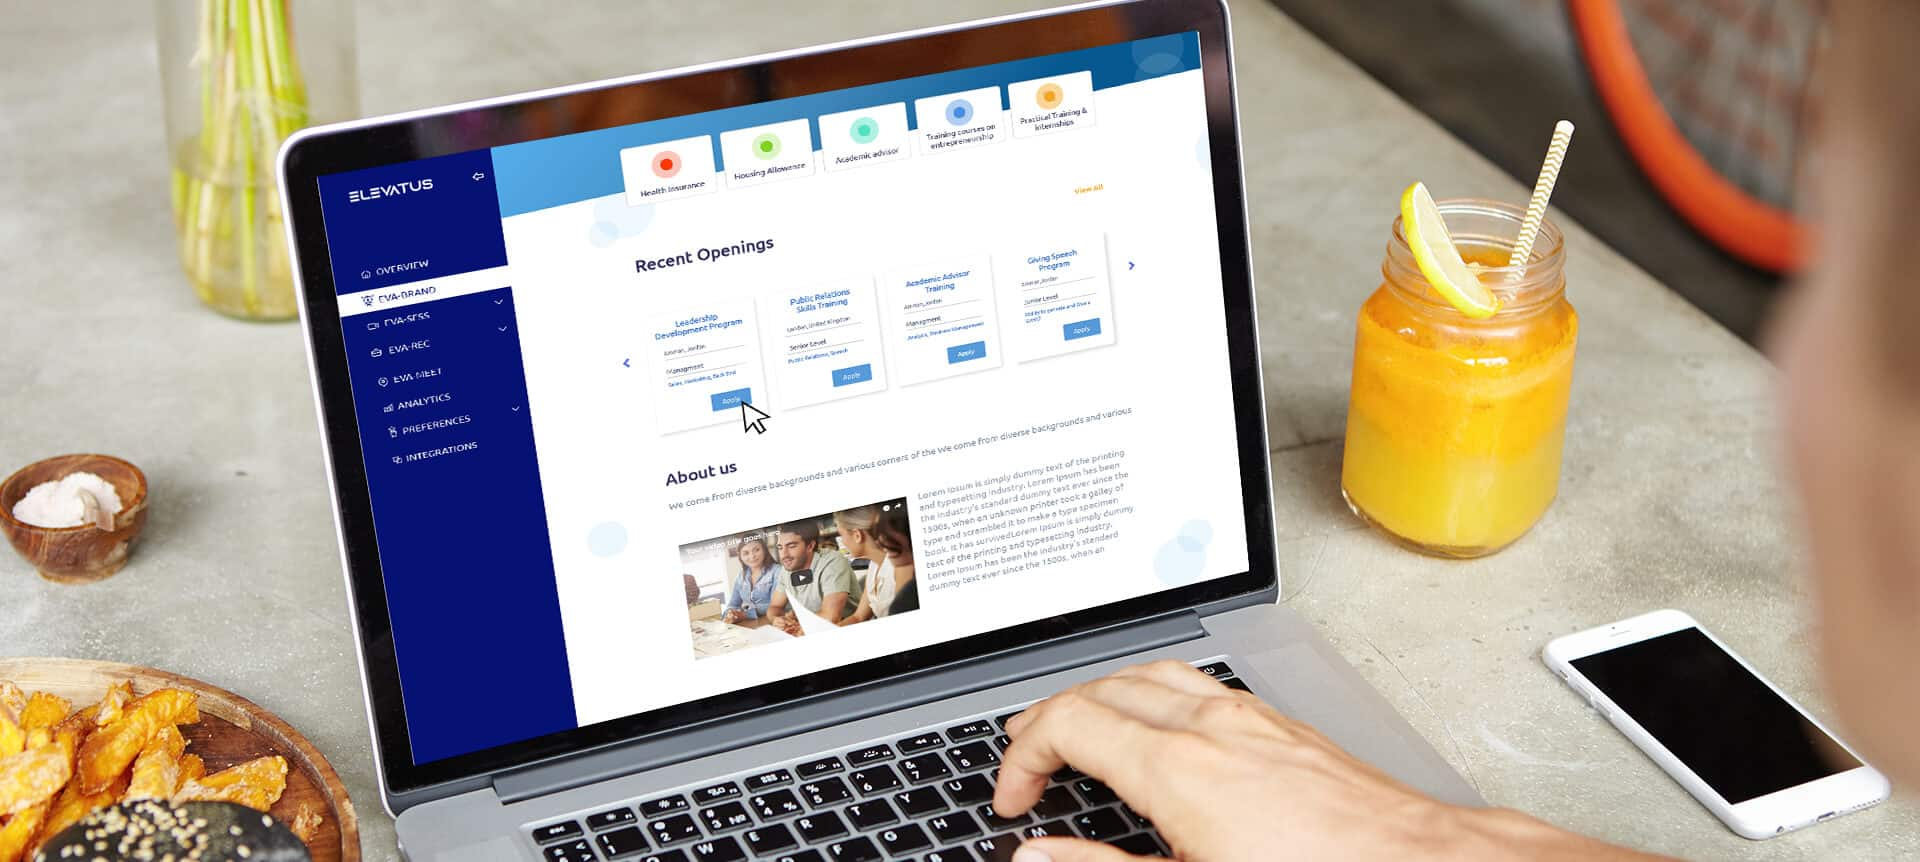 laptop showing recruitment software